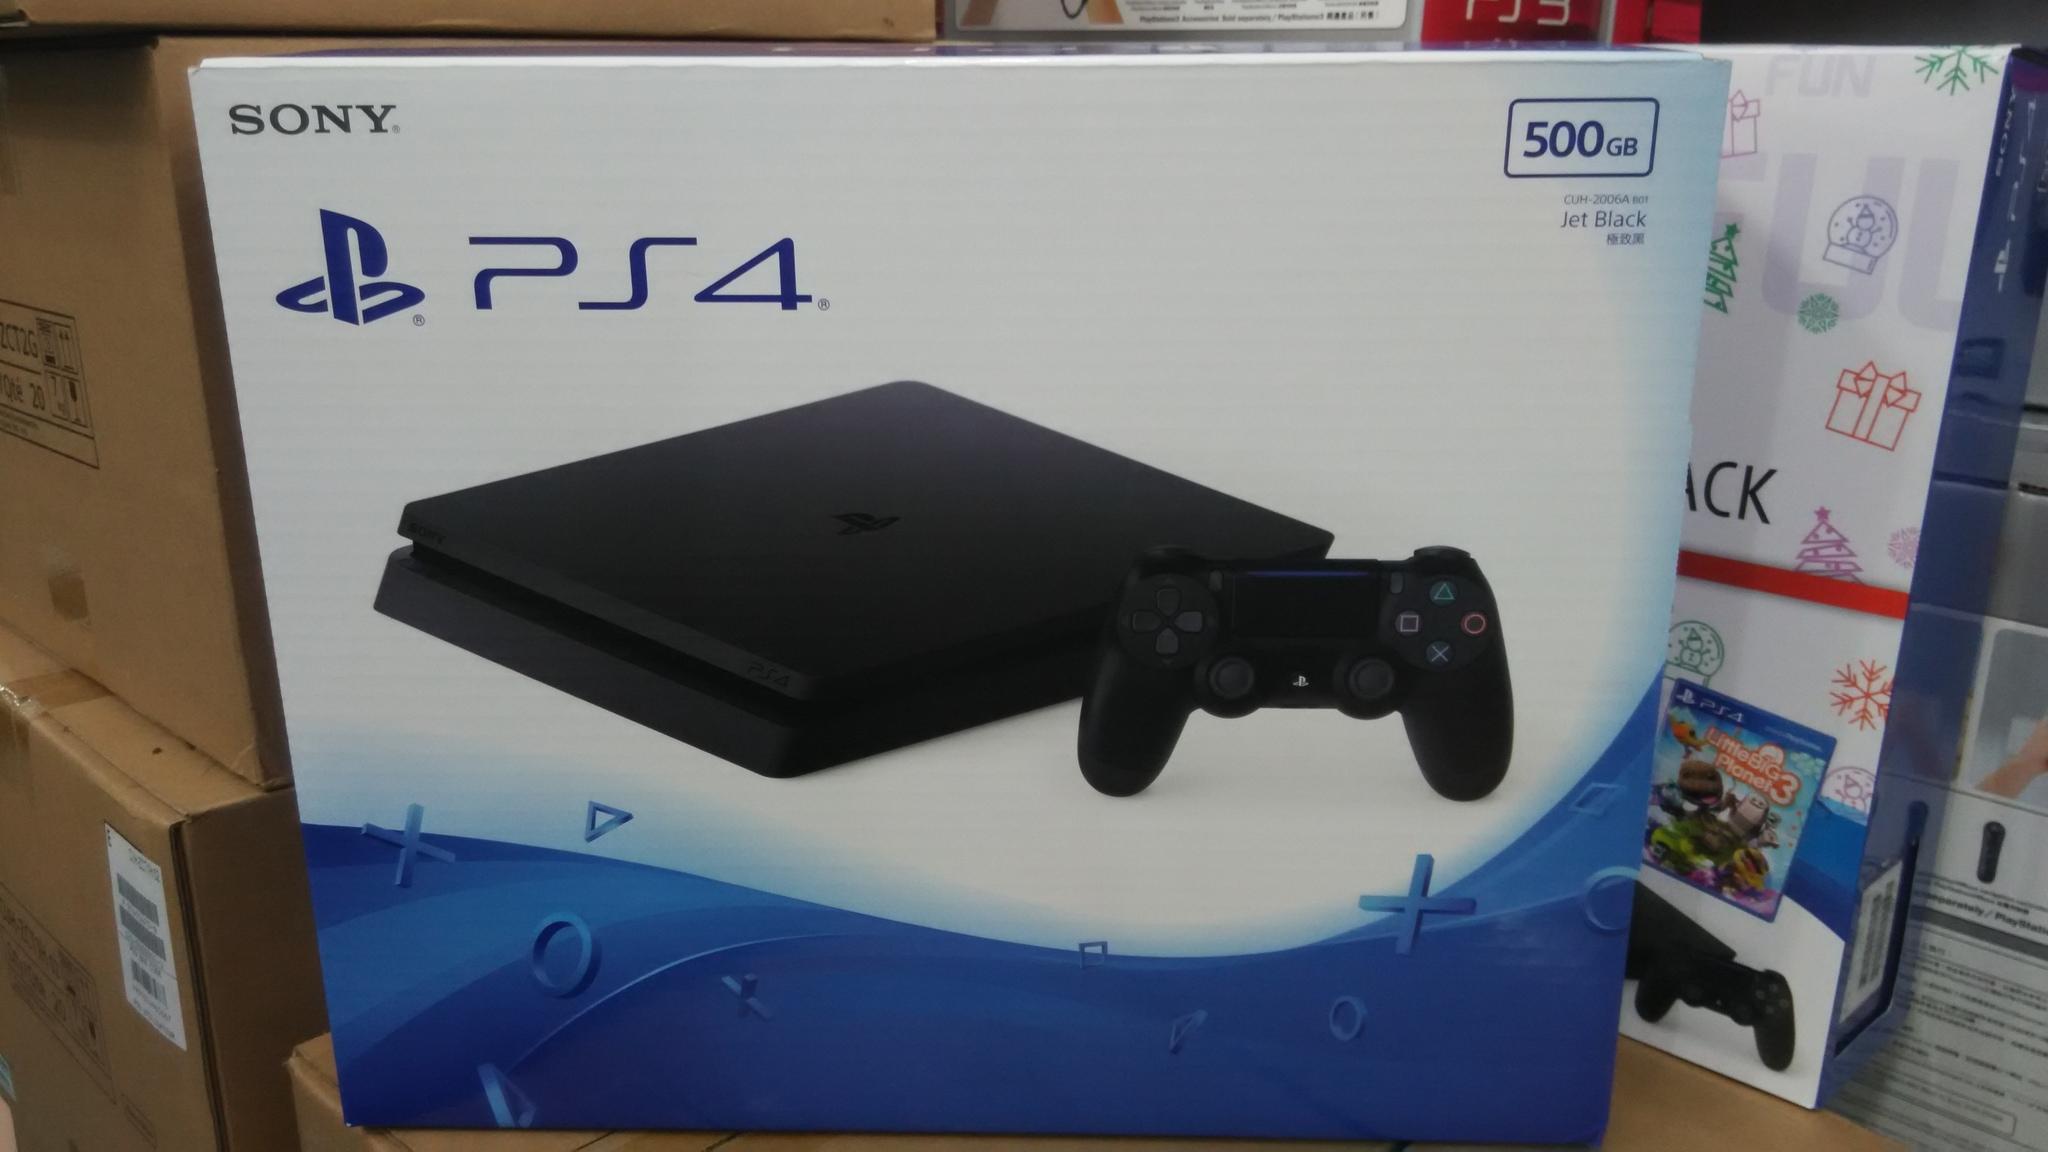 Jual Sony Ps4 Playstation 4 Slim 500gb Cuh 2006a Garansi Resmi Action Cam Store Tokopedia